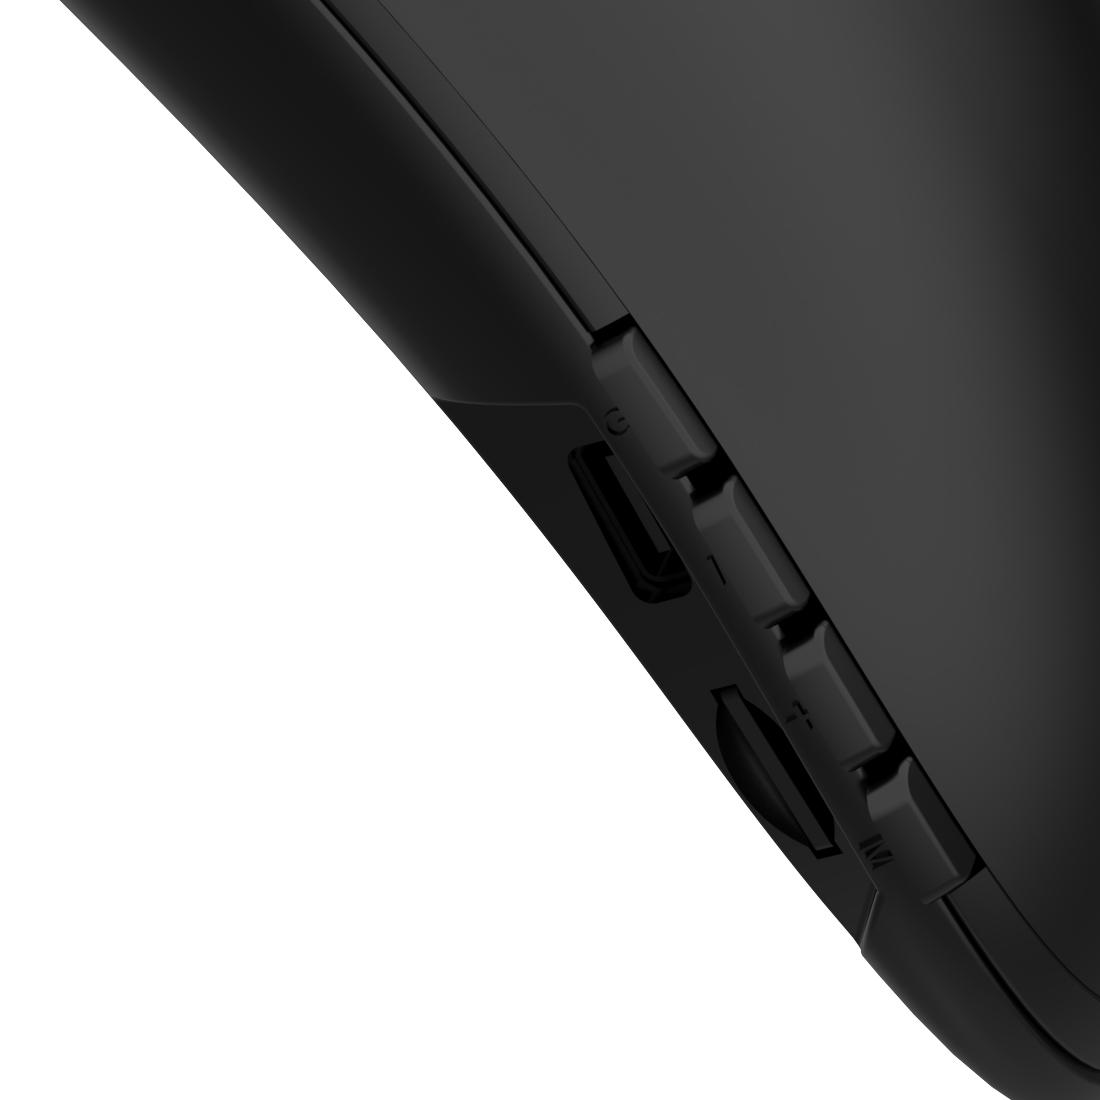 Bluedio HS Bluetooth 5.0 Portable Wireless Neck-mounted Speaker